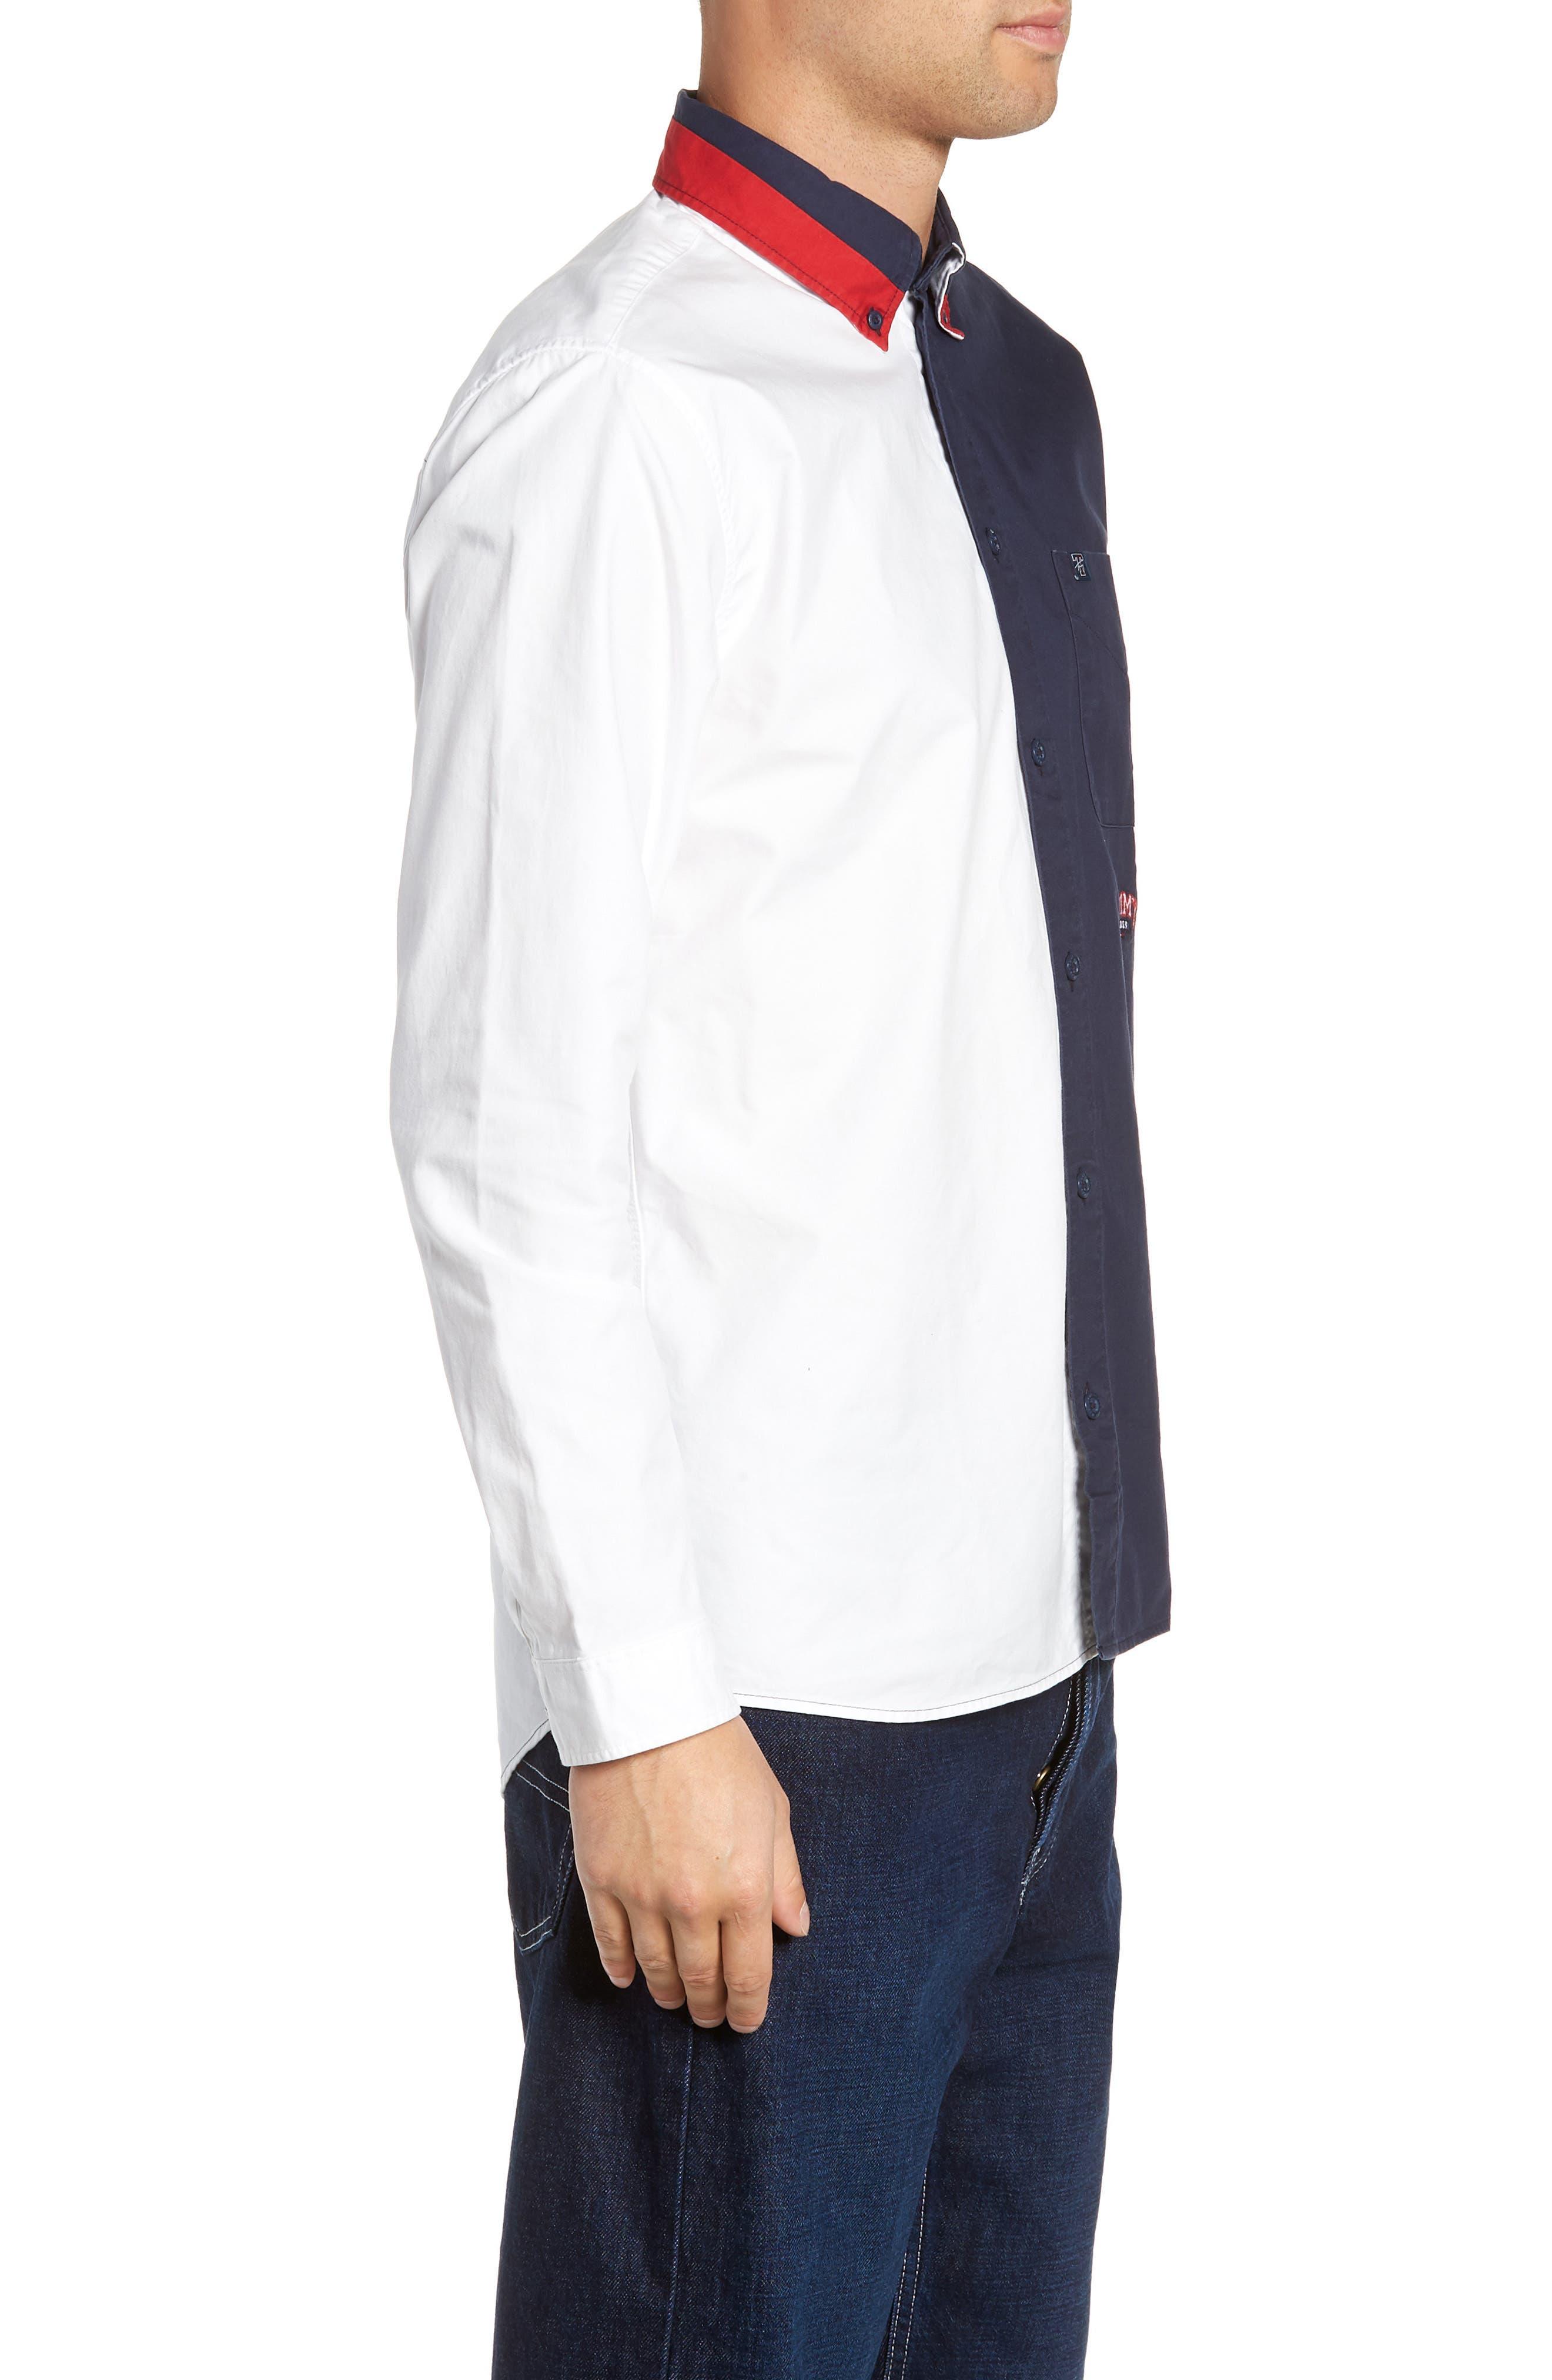 Half & Half Shirt,                             Alternate thumbnail 4, color,                             CLASSIC WHITE / BLACK IRIS